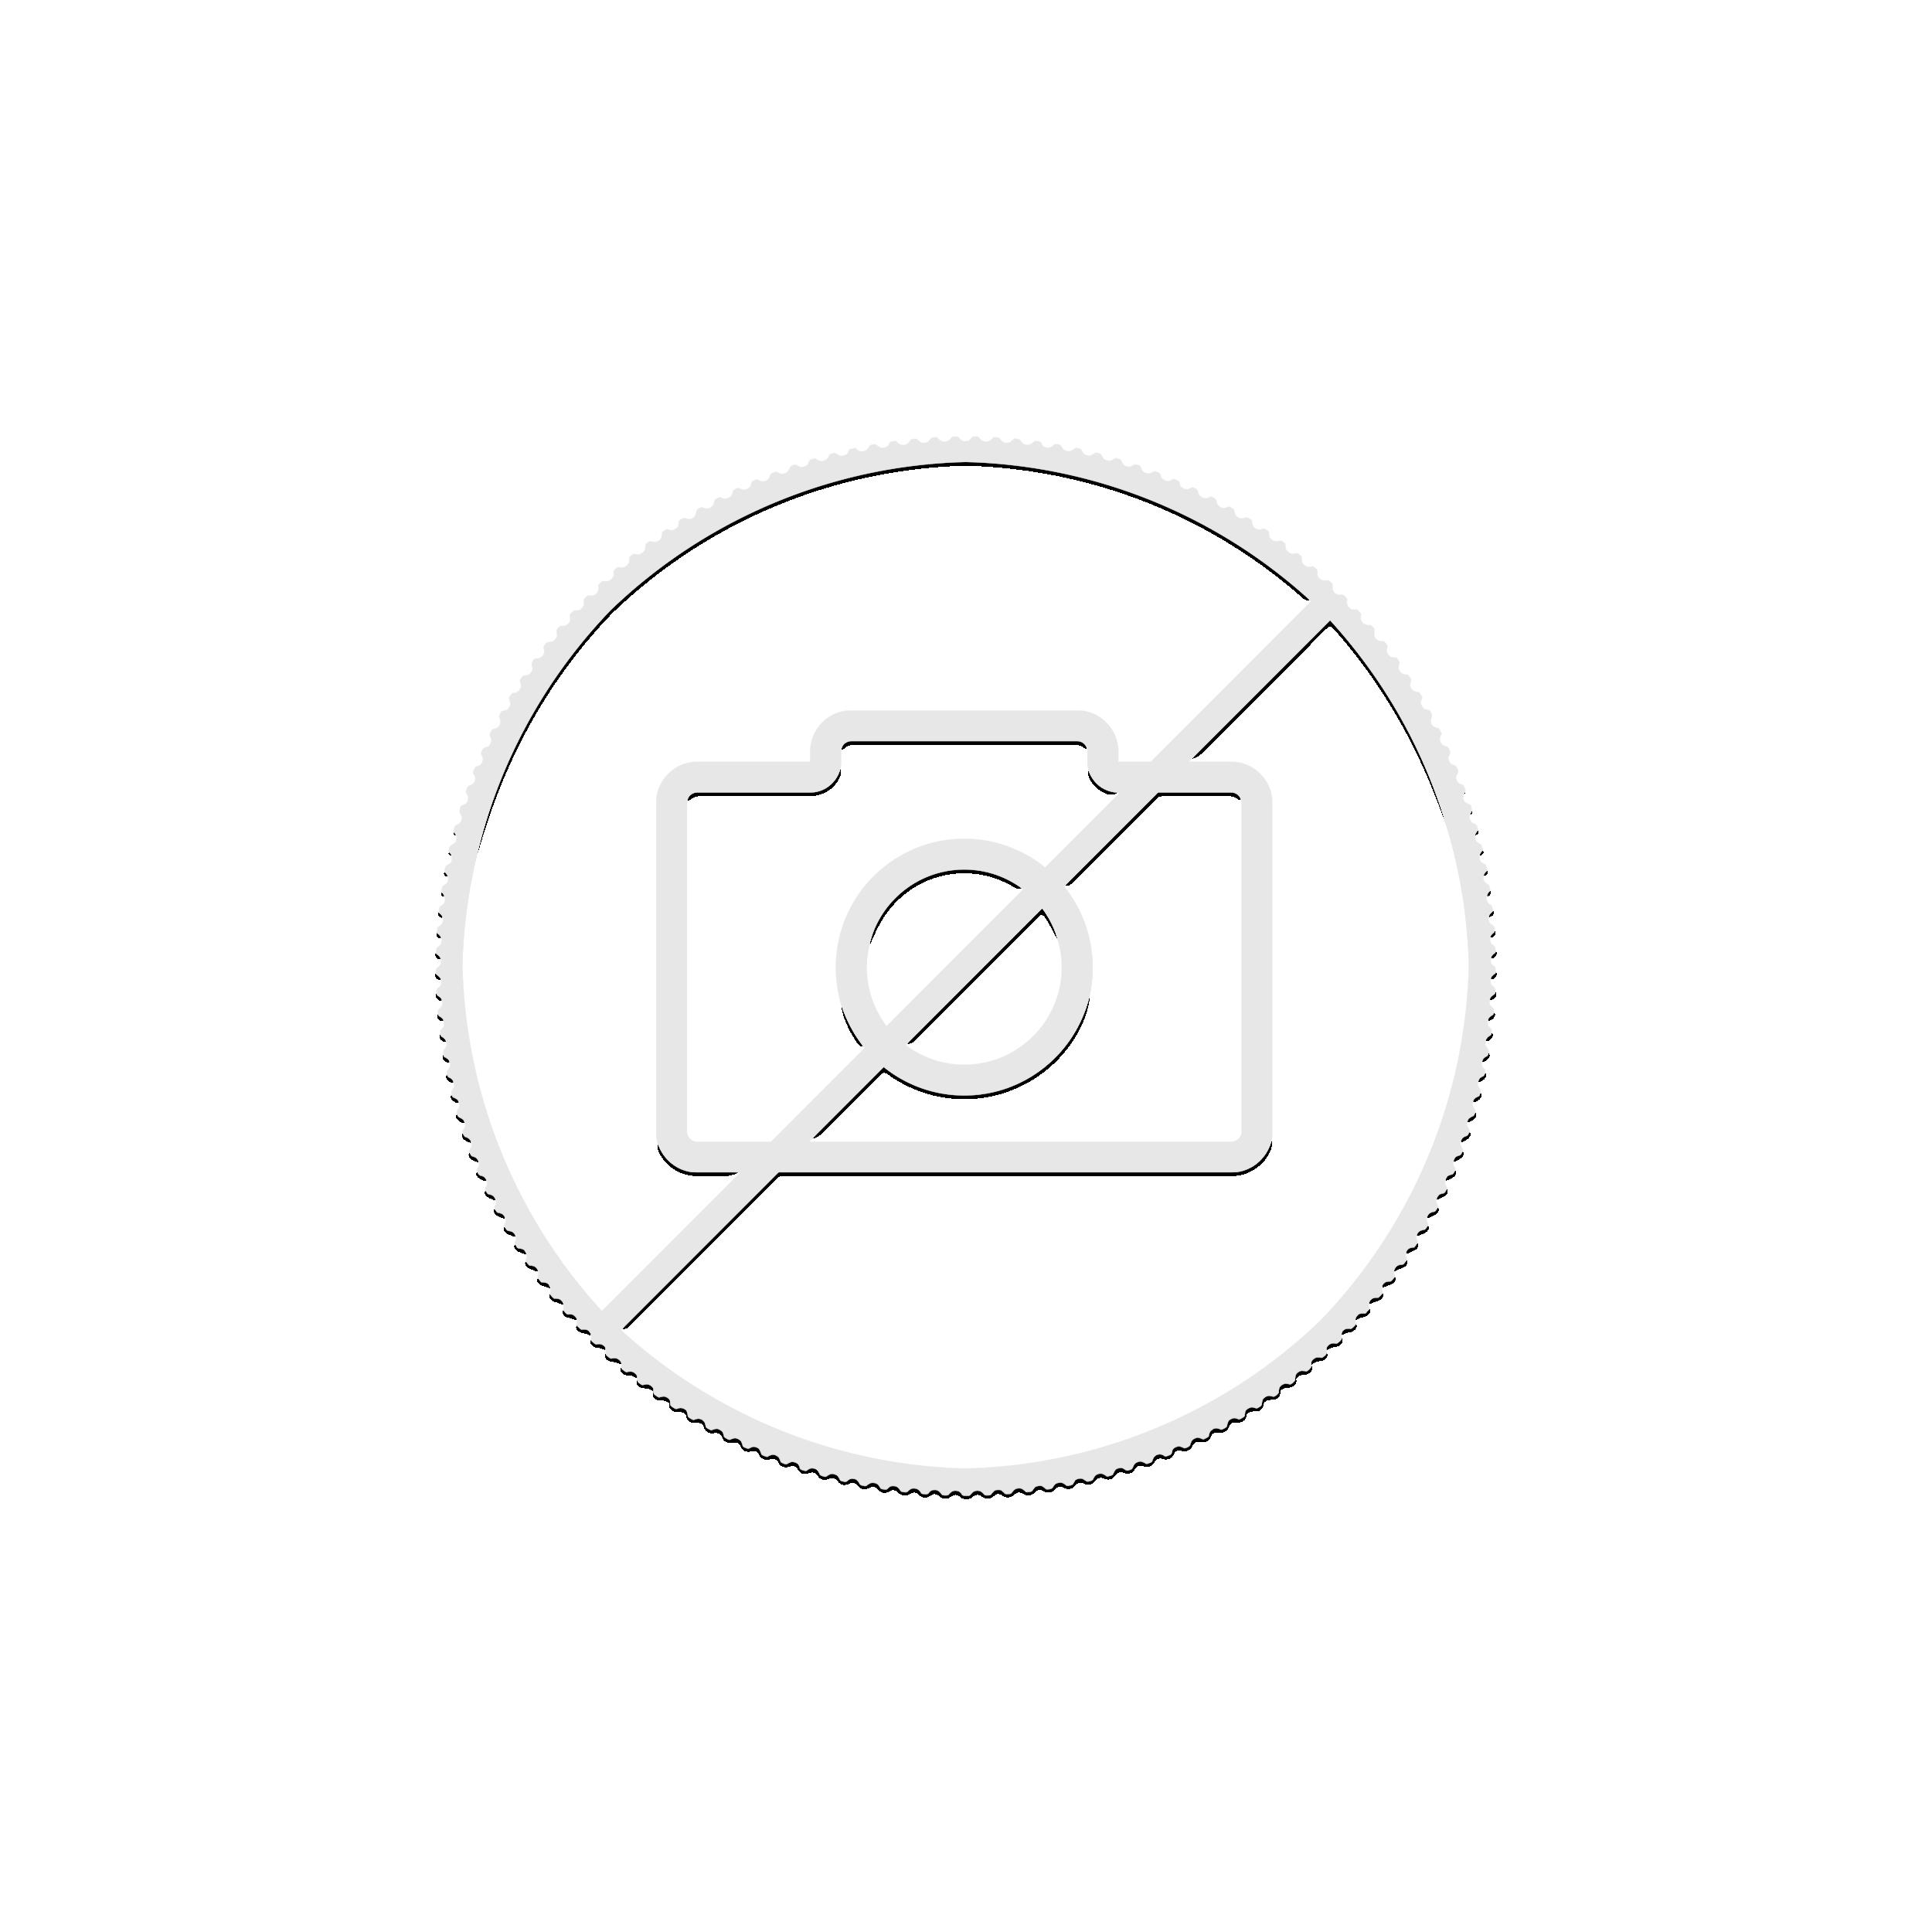 1 troy ounce gouden Lunar munt 2021 - Os